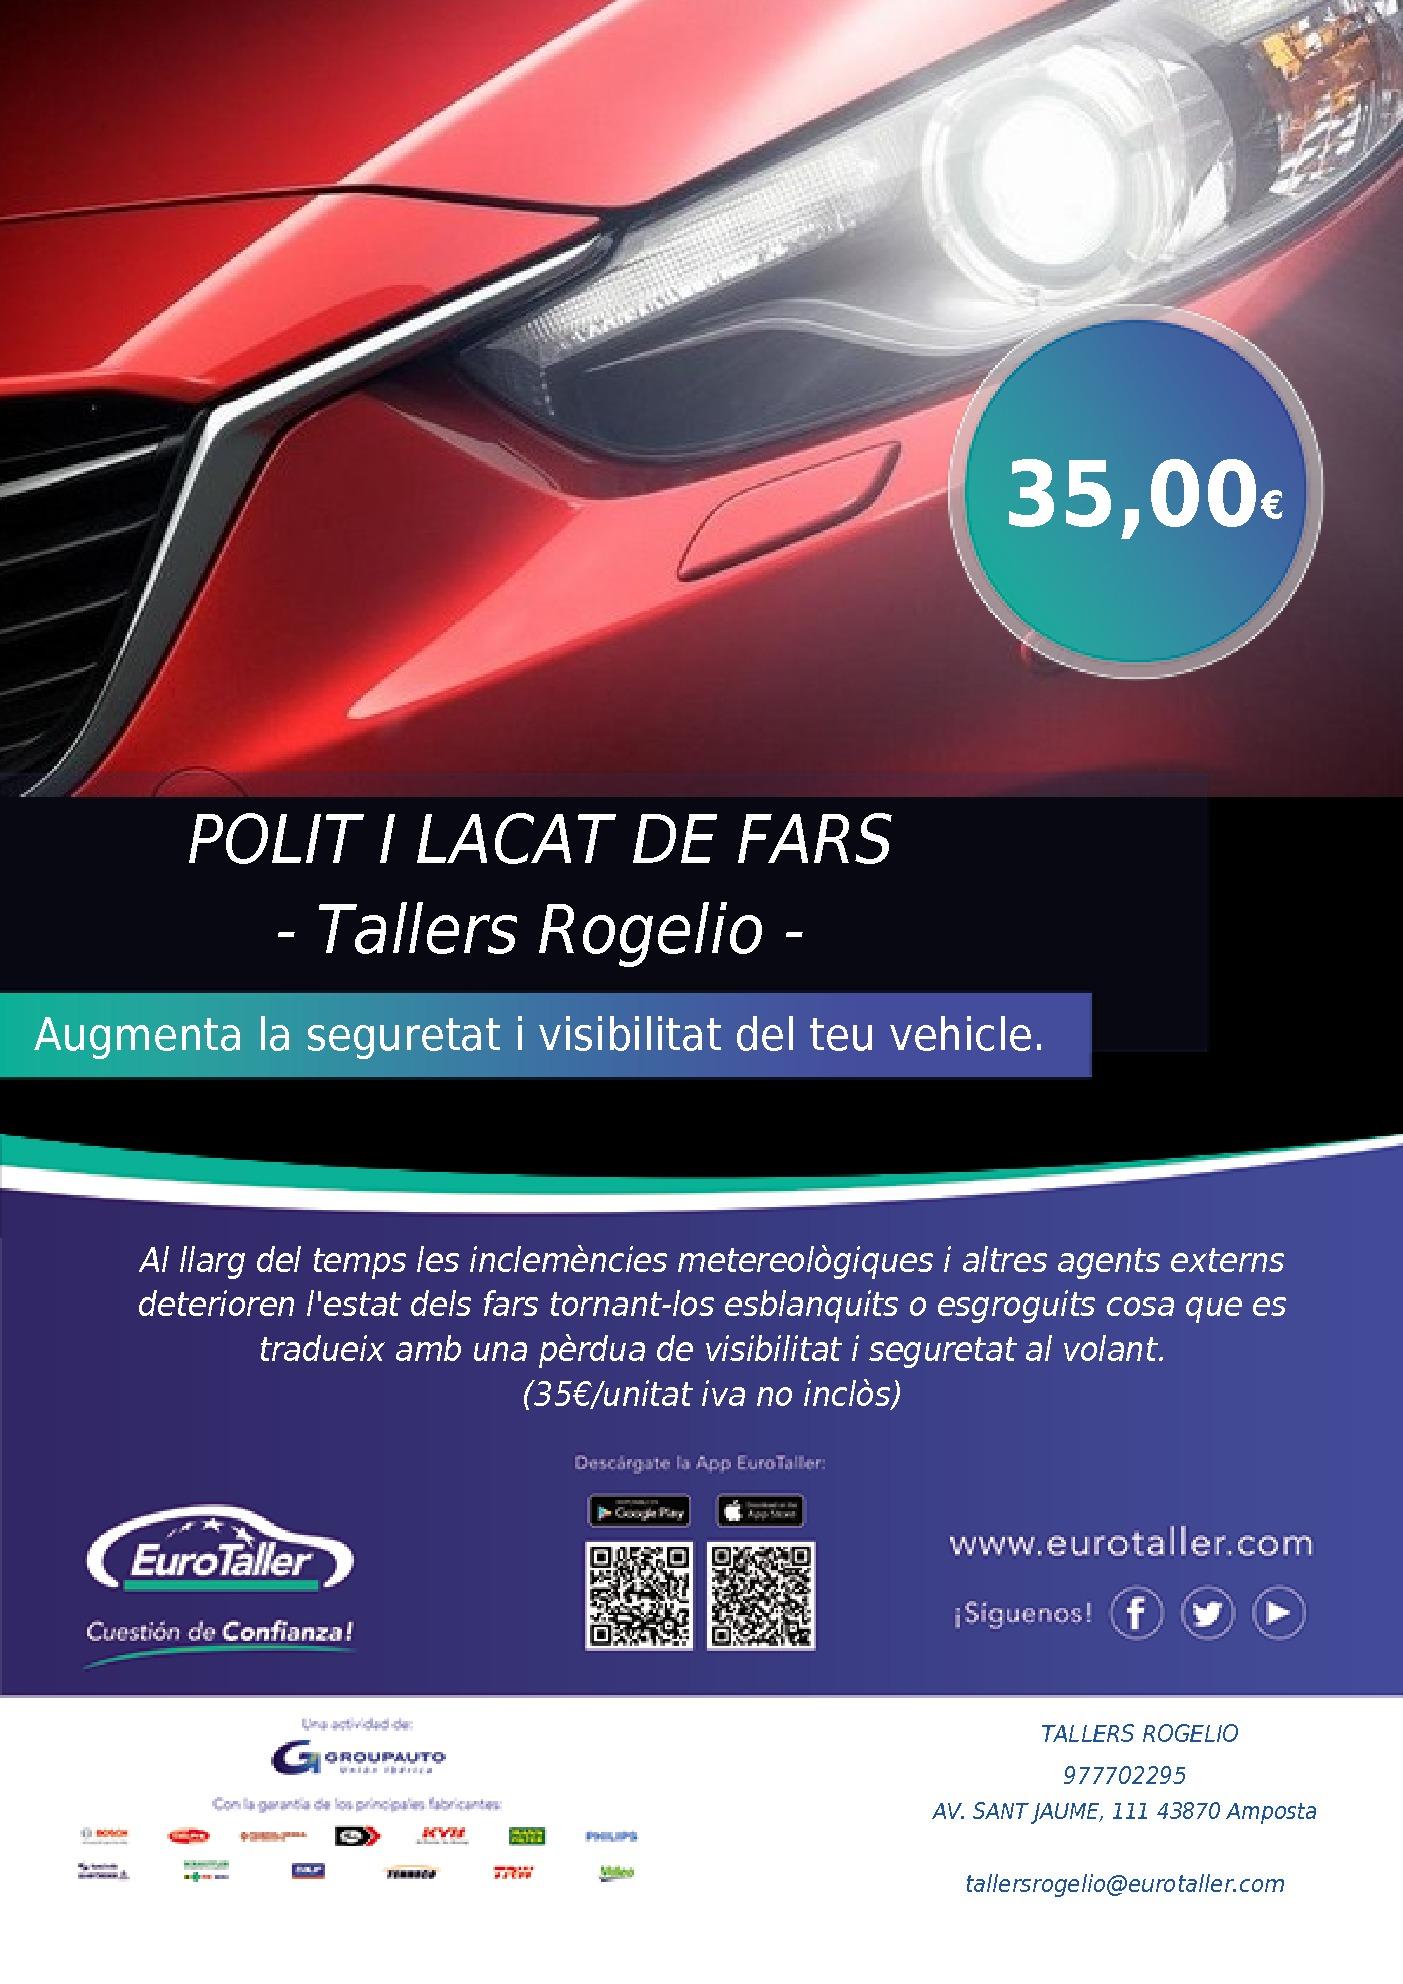 POLIT I LACAT DE FARS - Tallers Rogelio -